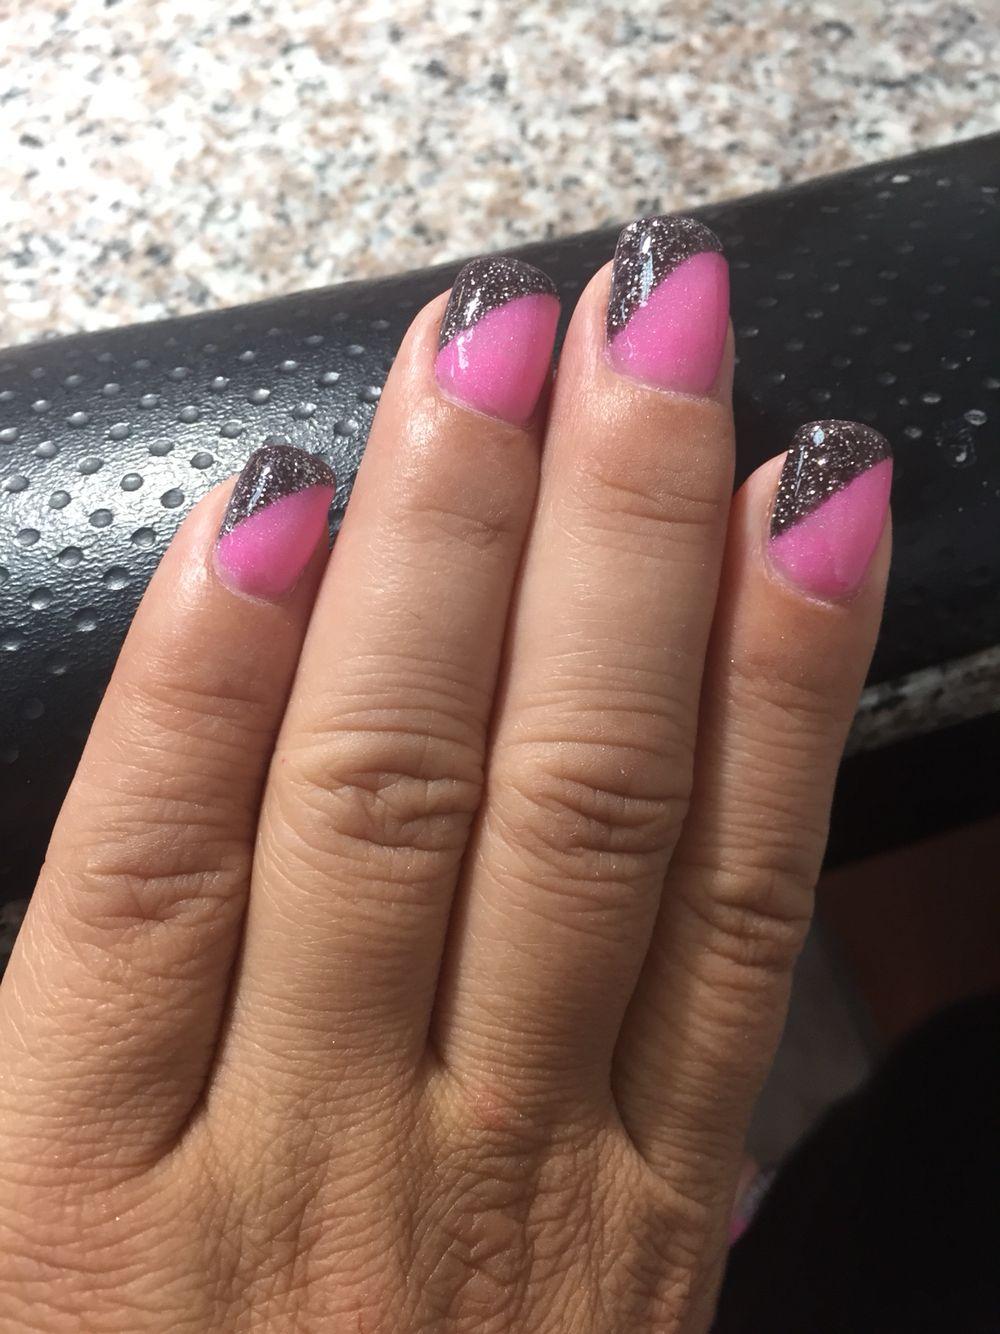 Two colors, nexgen nails   Nail art   Pinterest